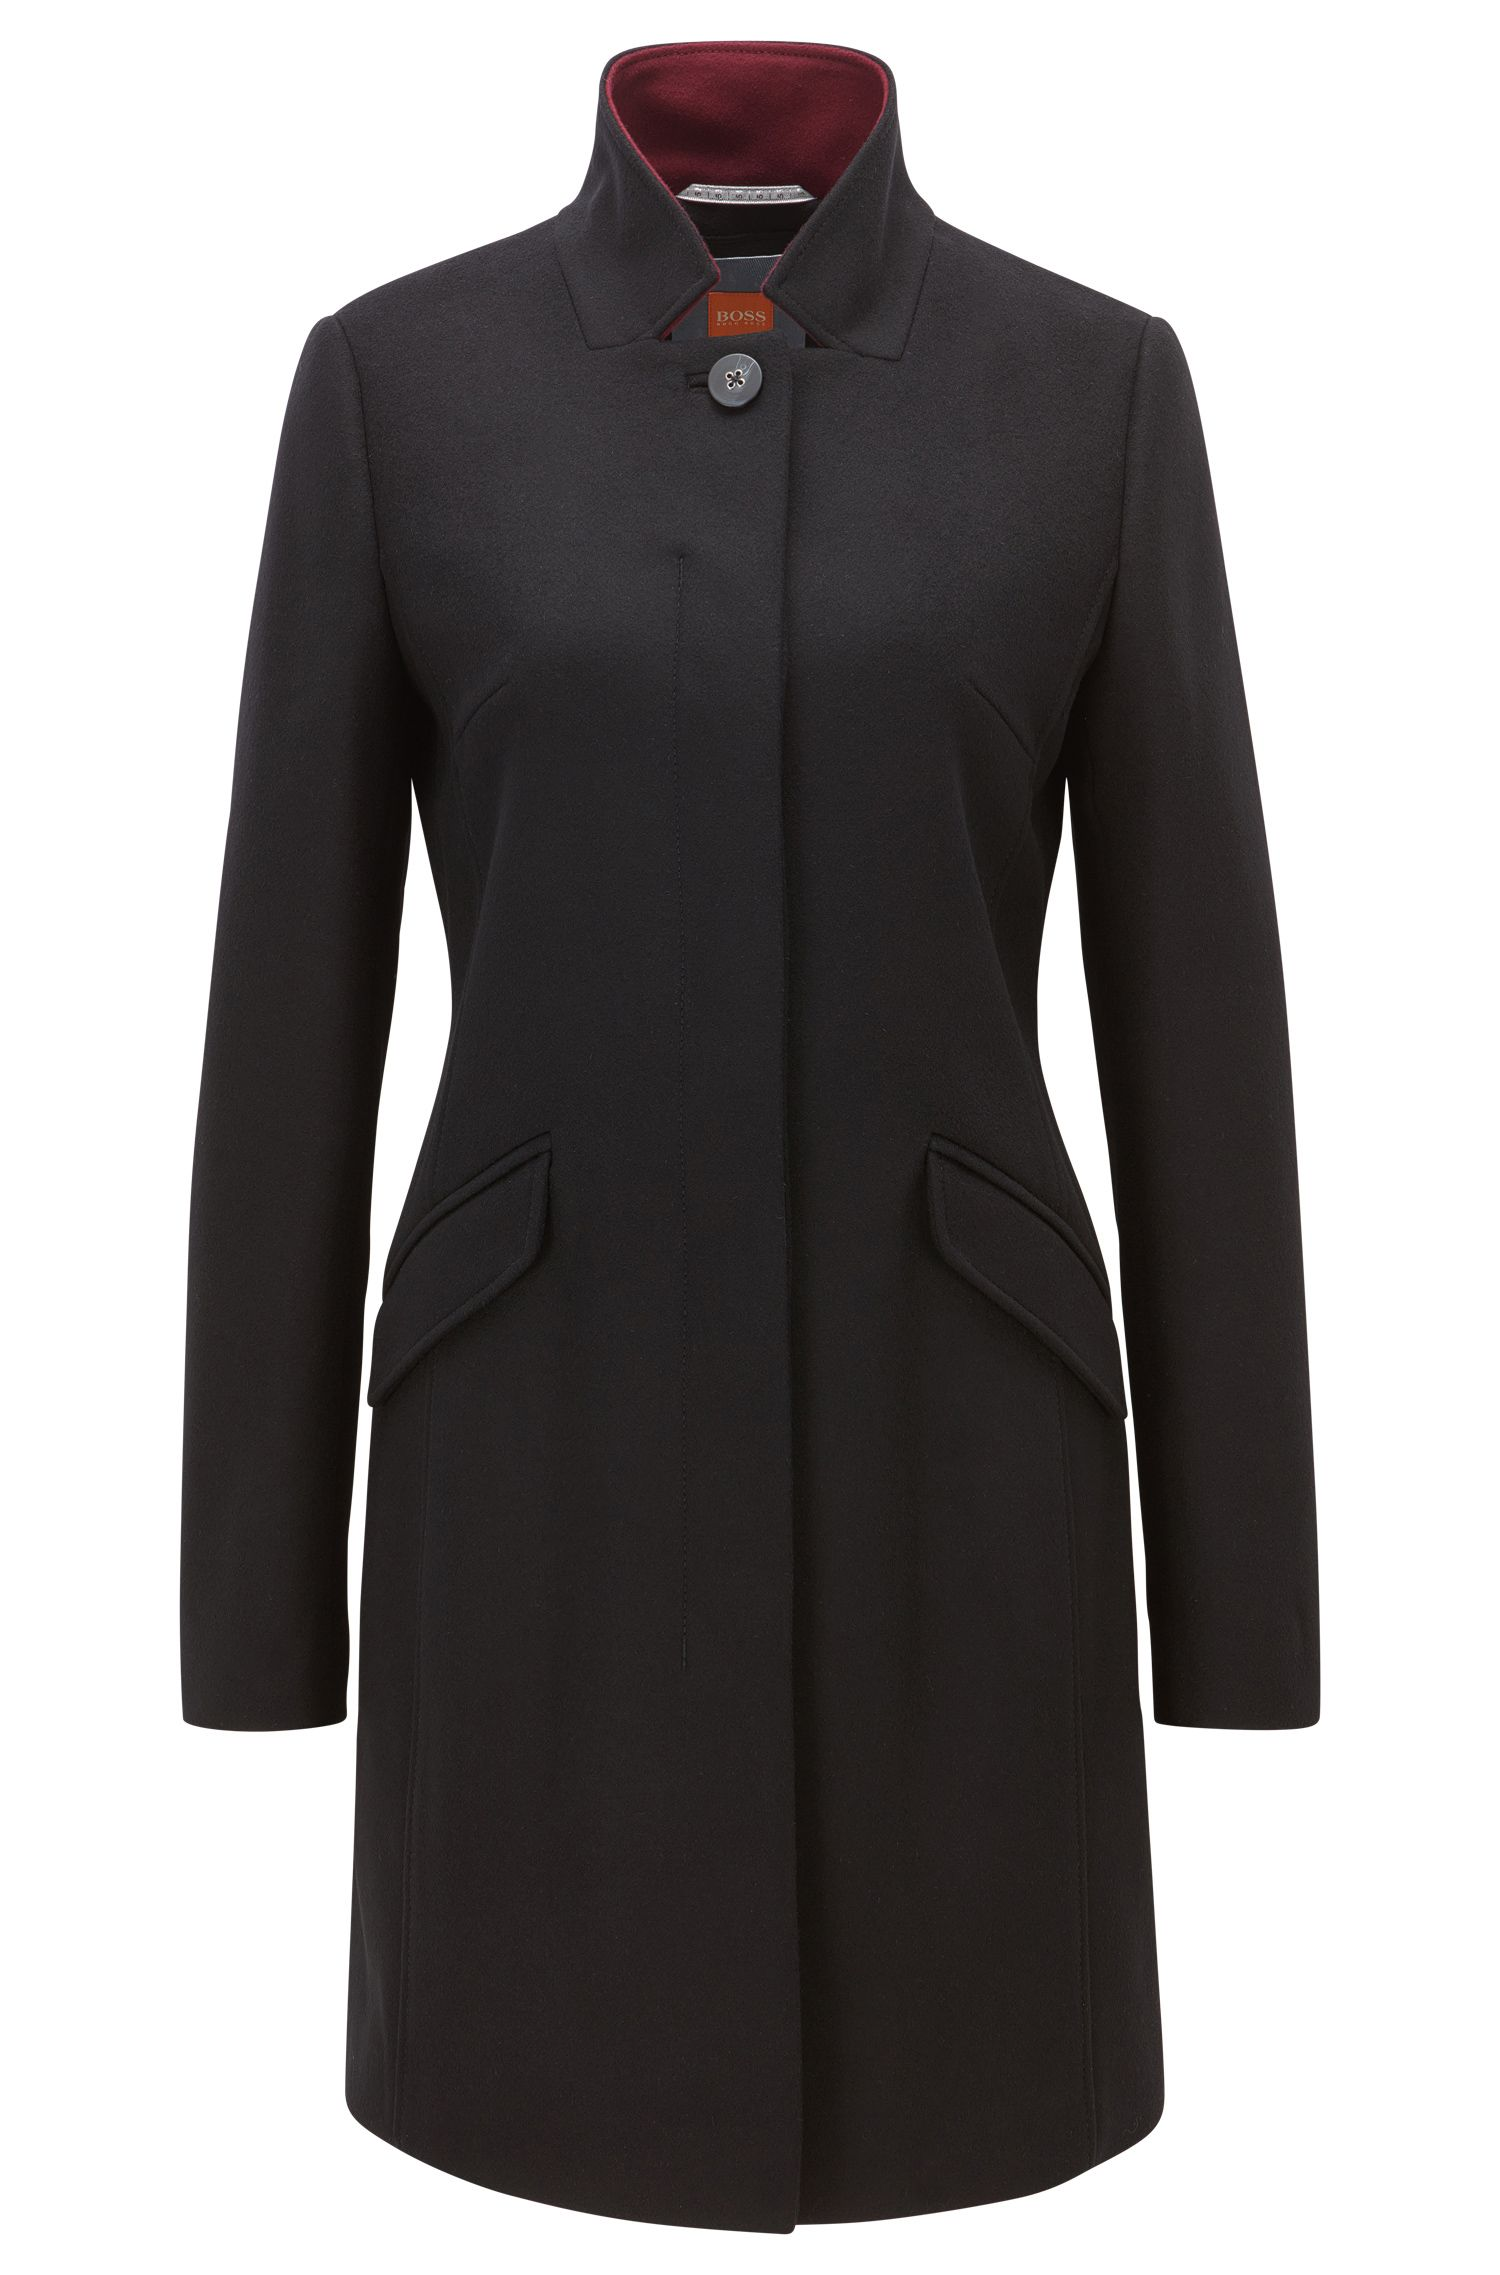 Abrigo con botones ocultos en mezcla de lana de peso medio